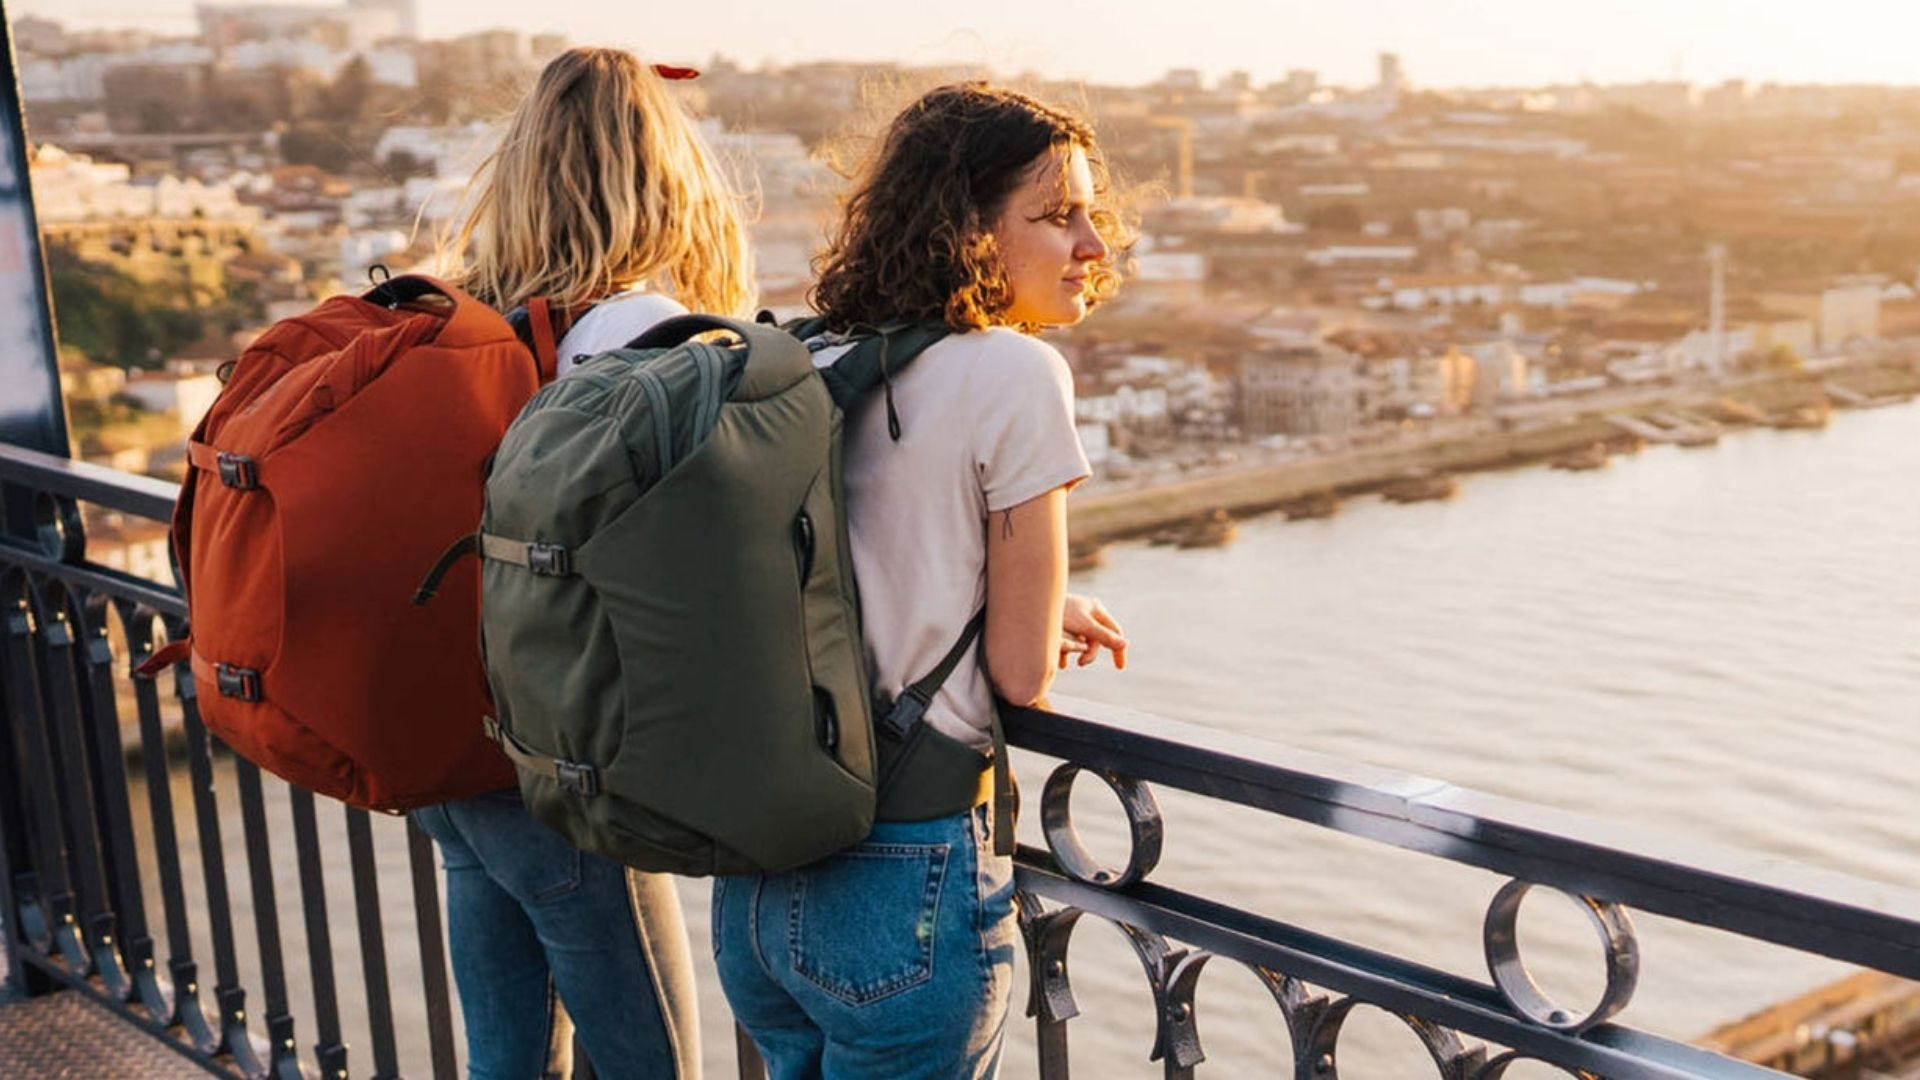 Two girls look over a bridge wearing travel baackpacks